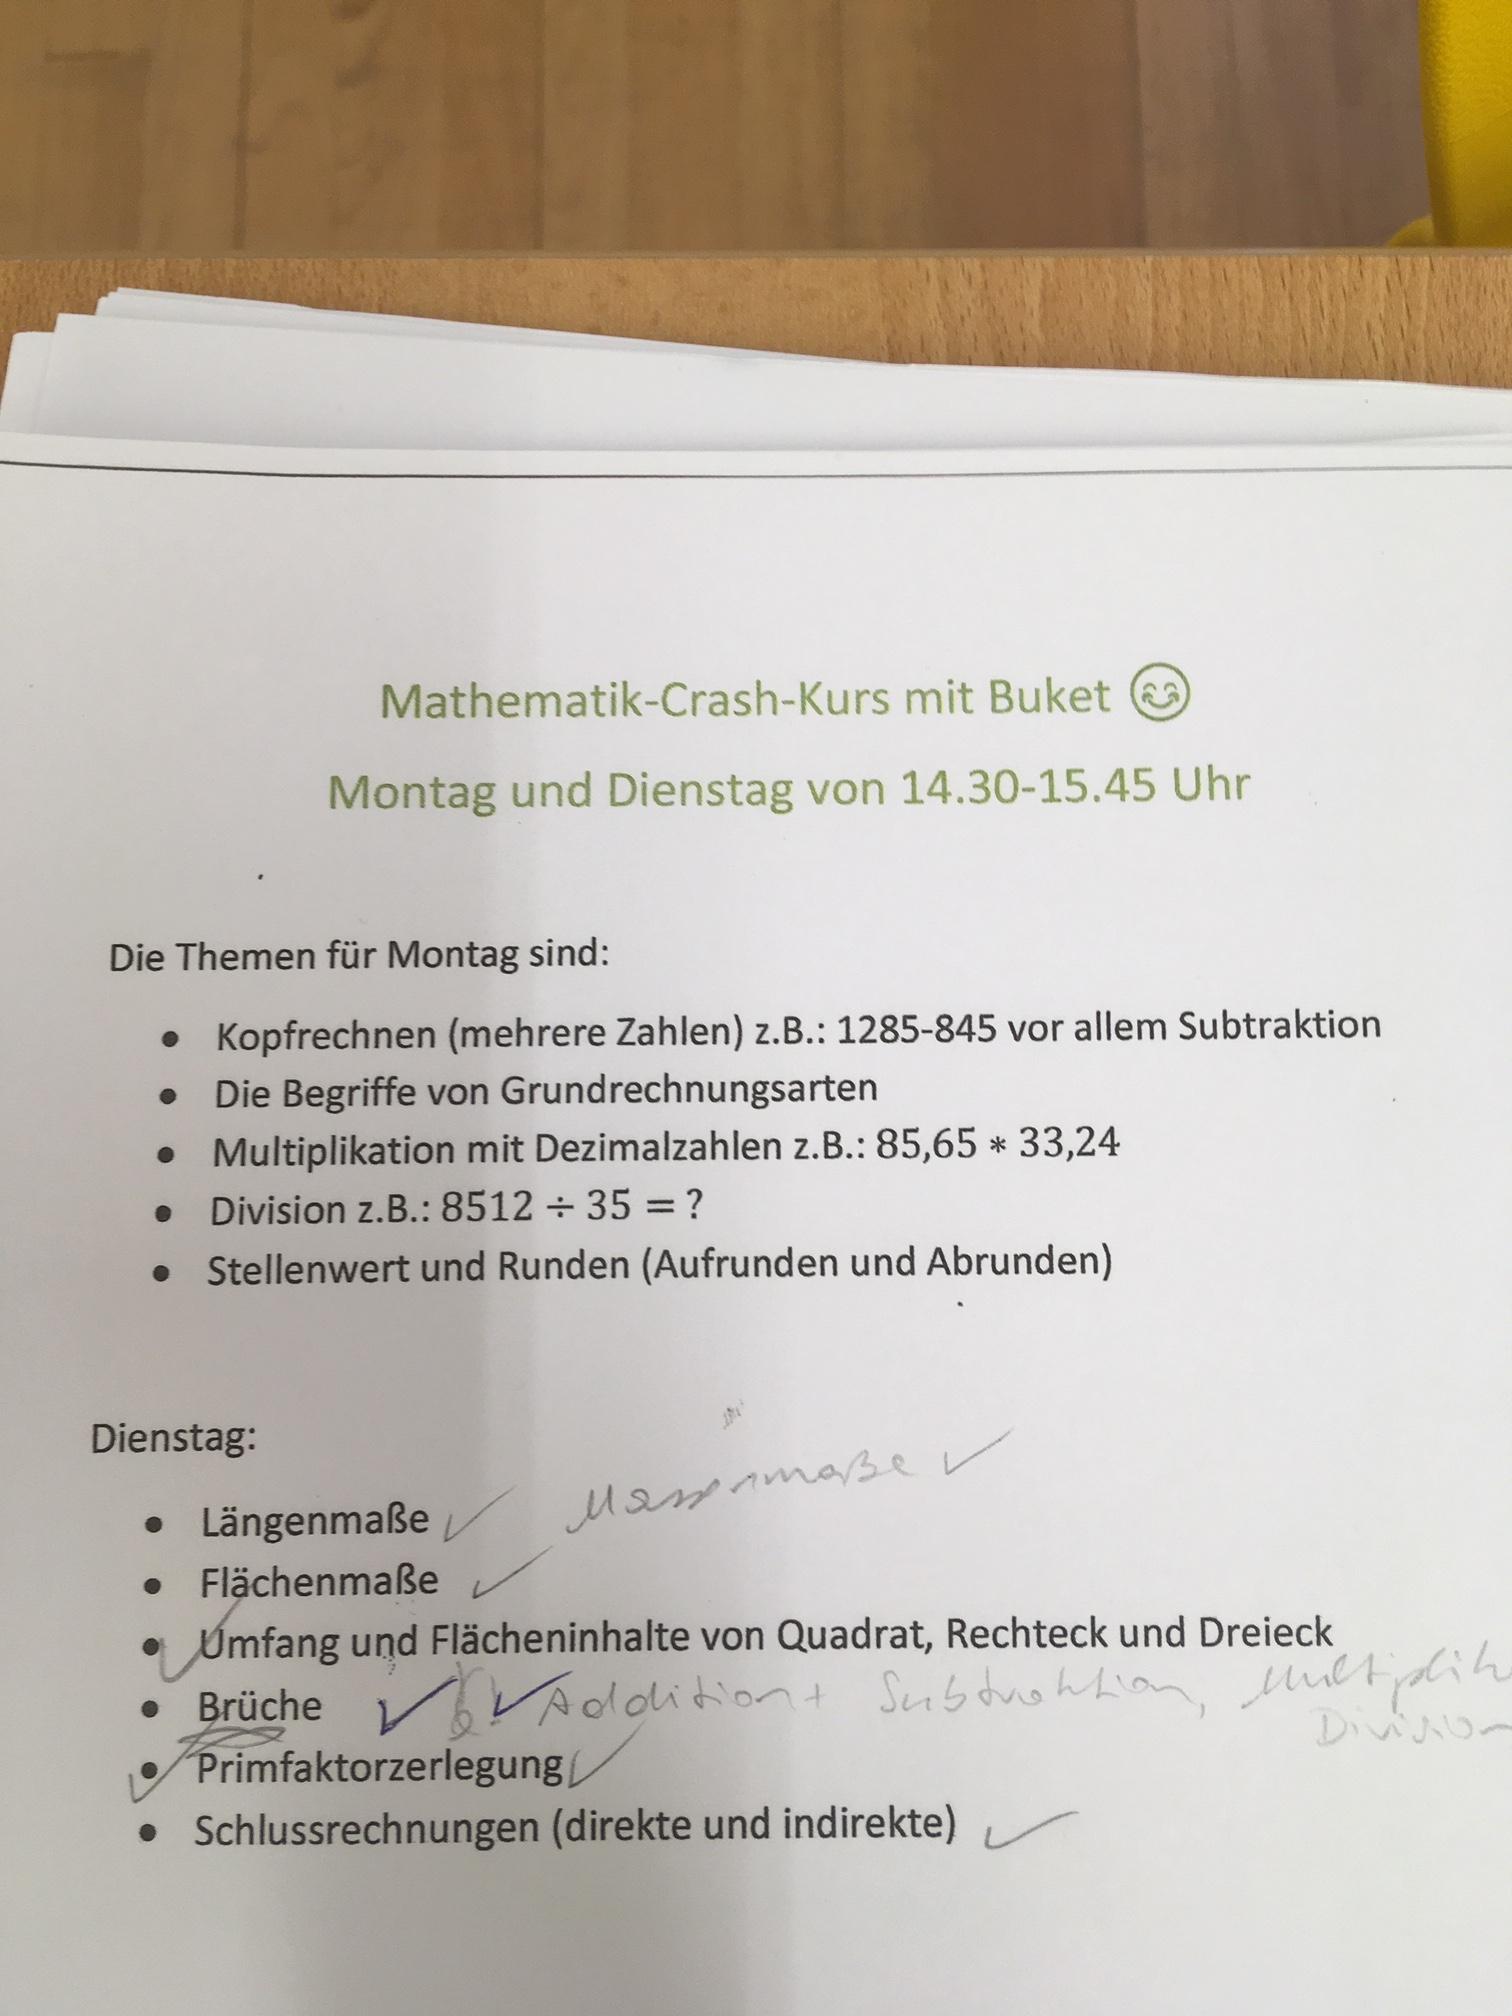 Übersicht-Inhalt-Mathe-Kurs